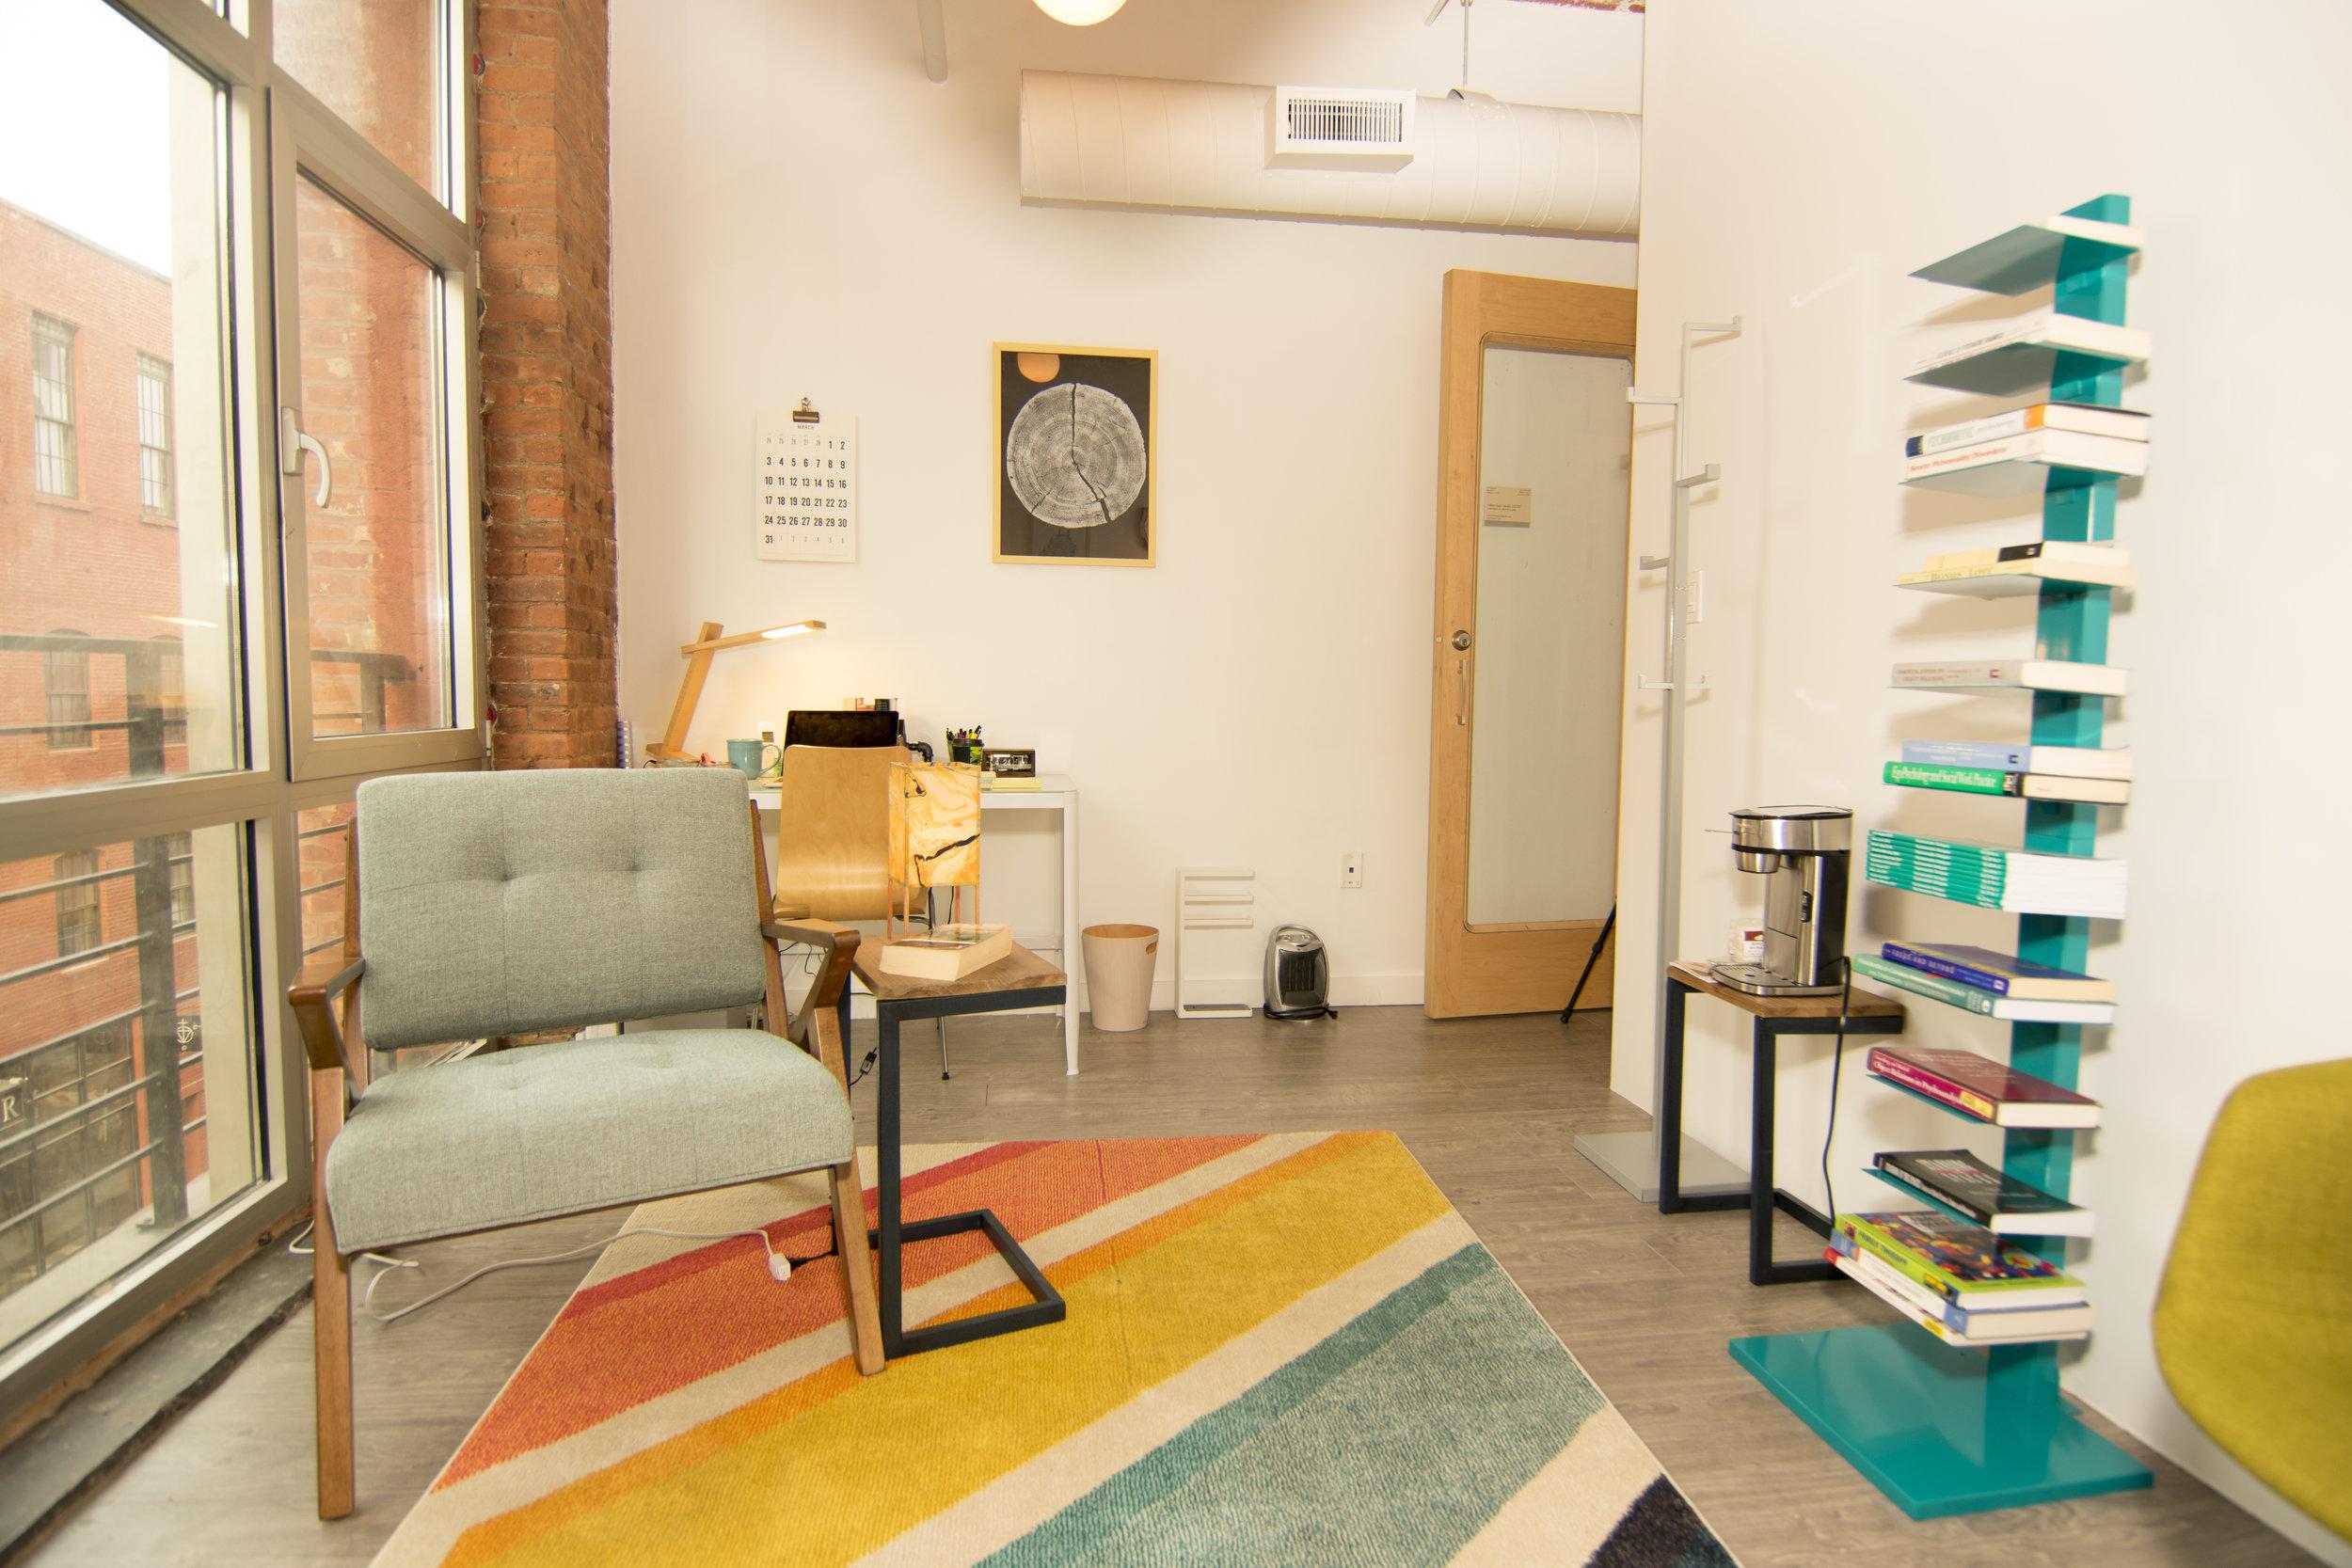 serene-offices-dumbo-patient-view-horizontal.jpg